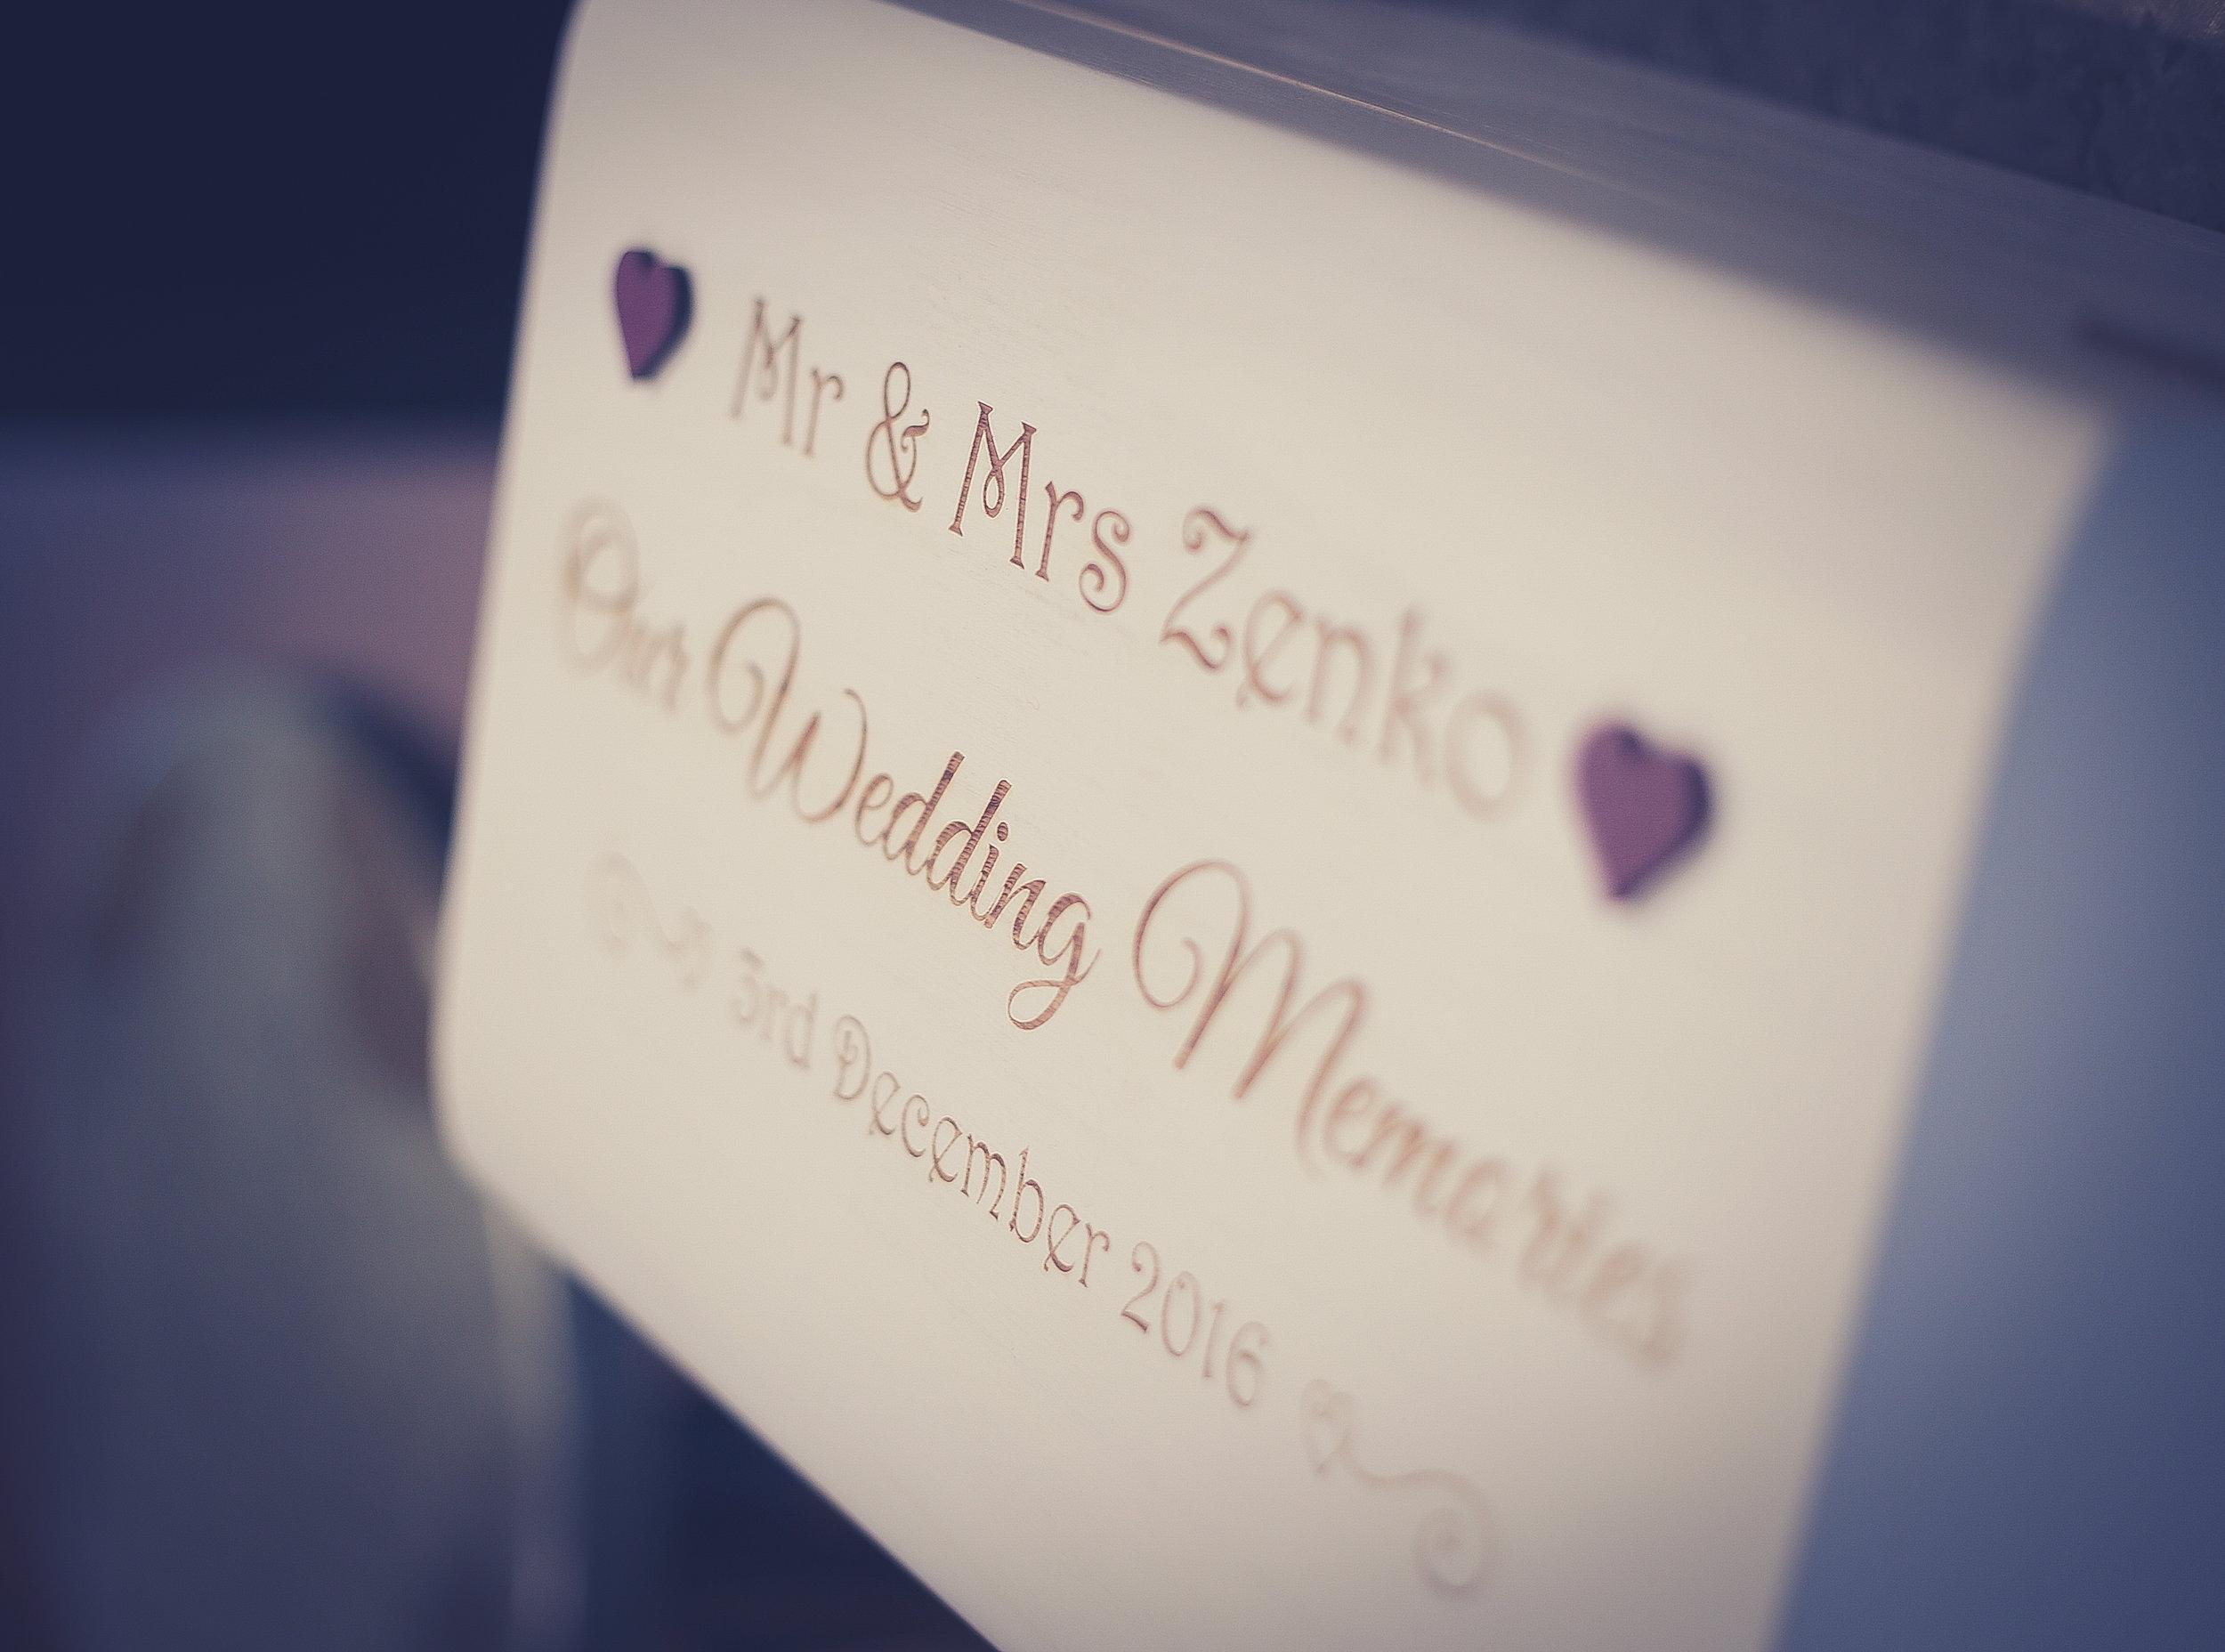 Weddings at the shankley hotel liverpool-1-11.jpg